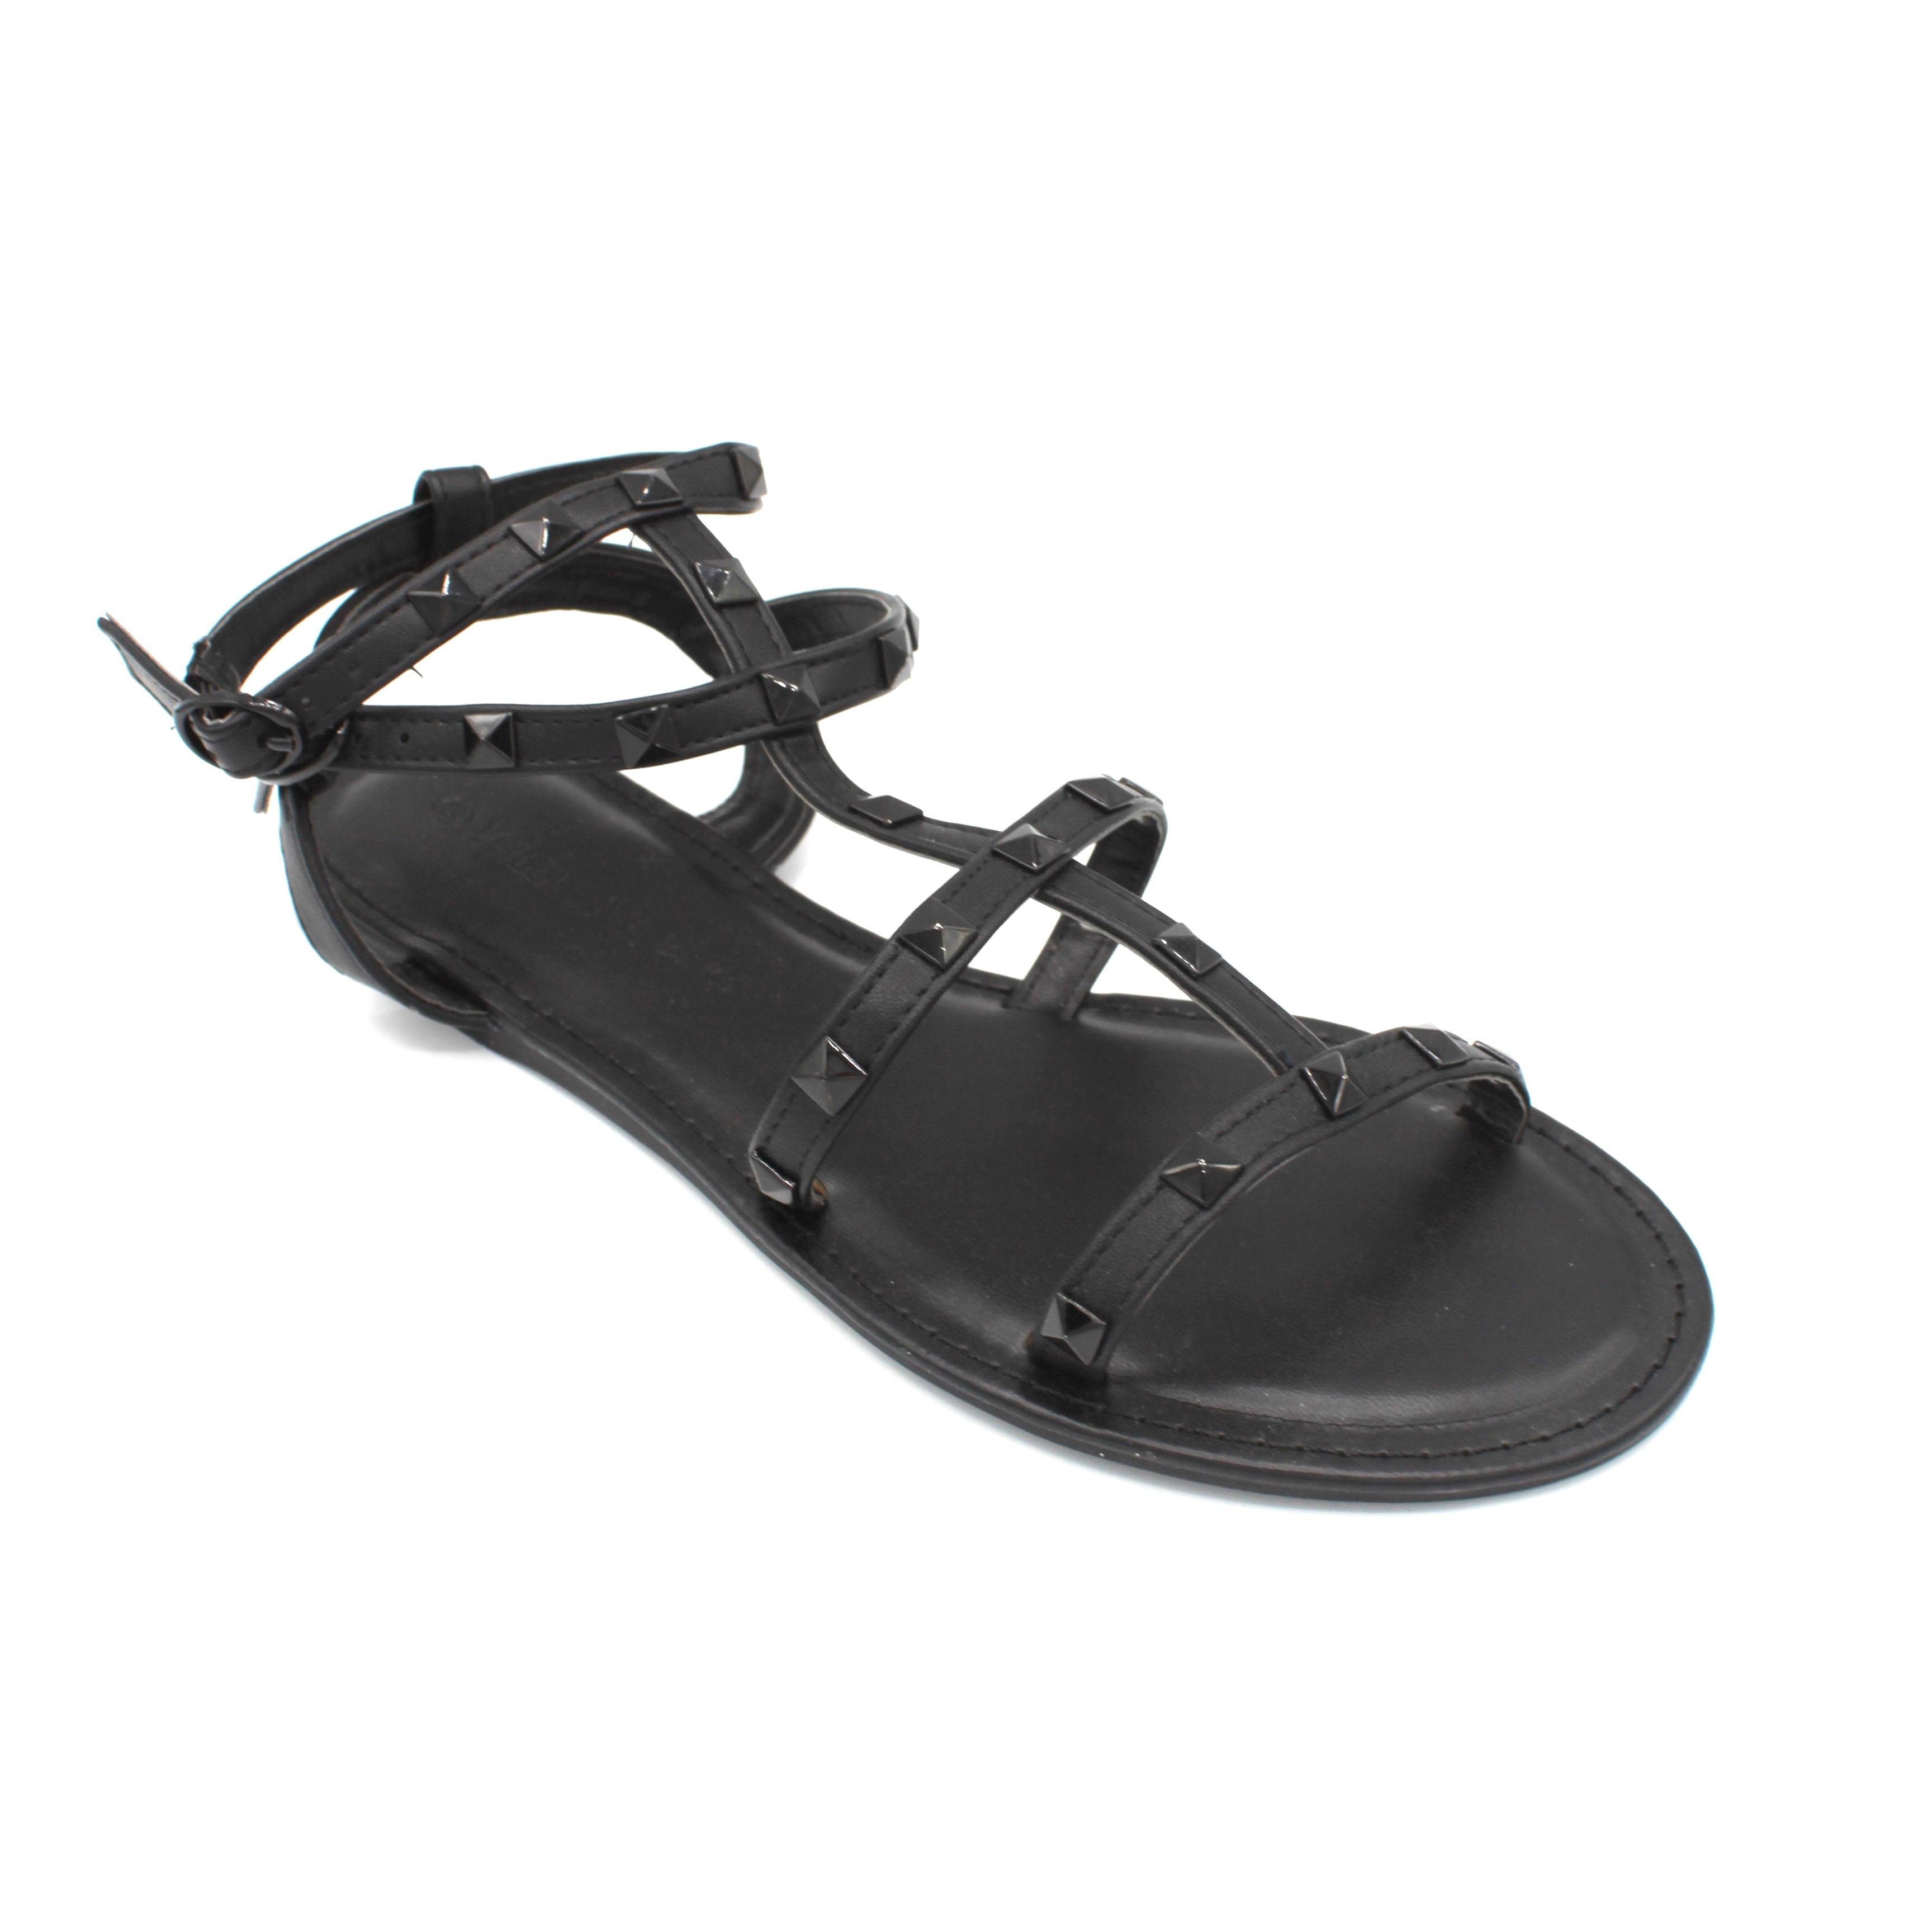 Clover Black Straps Black Studs Flat Sandals